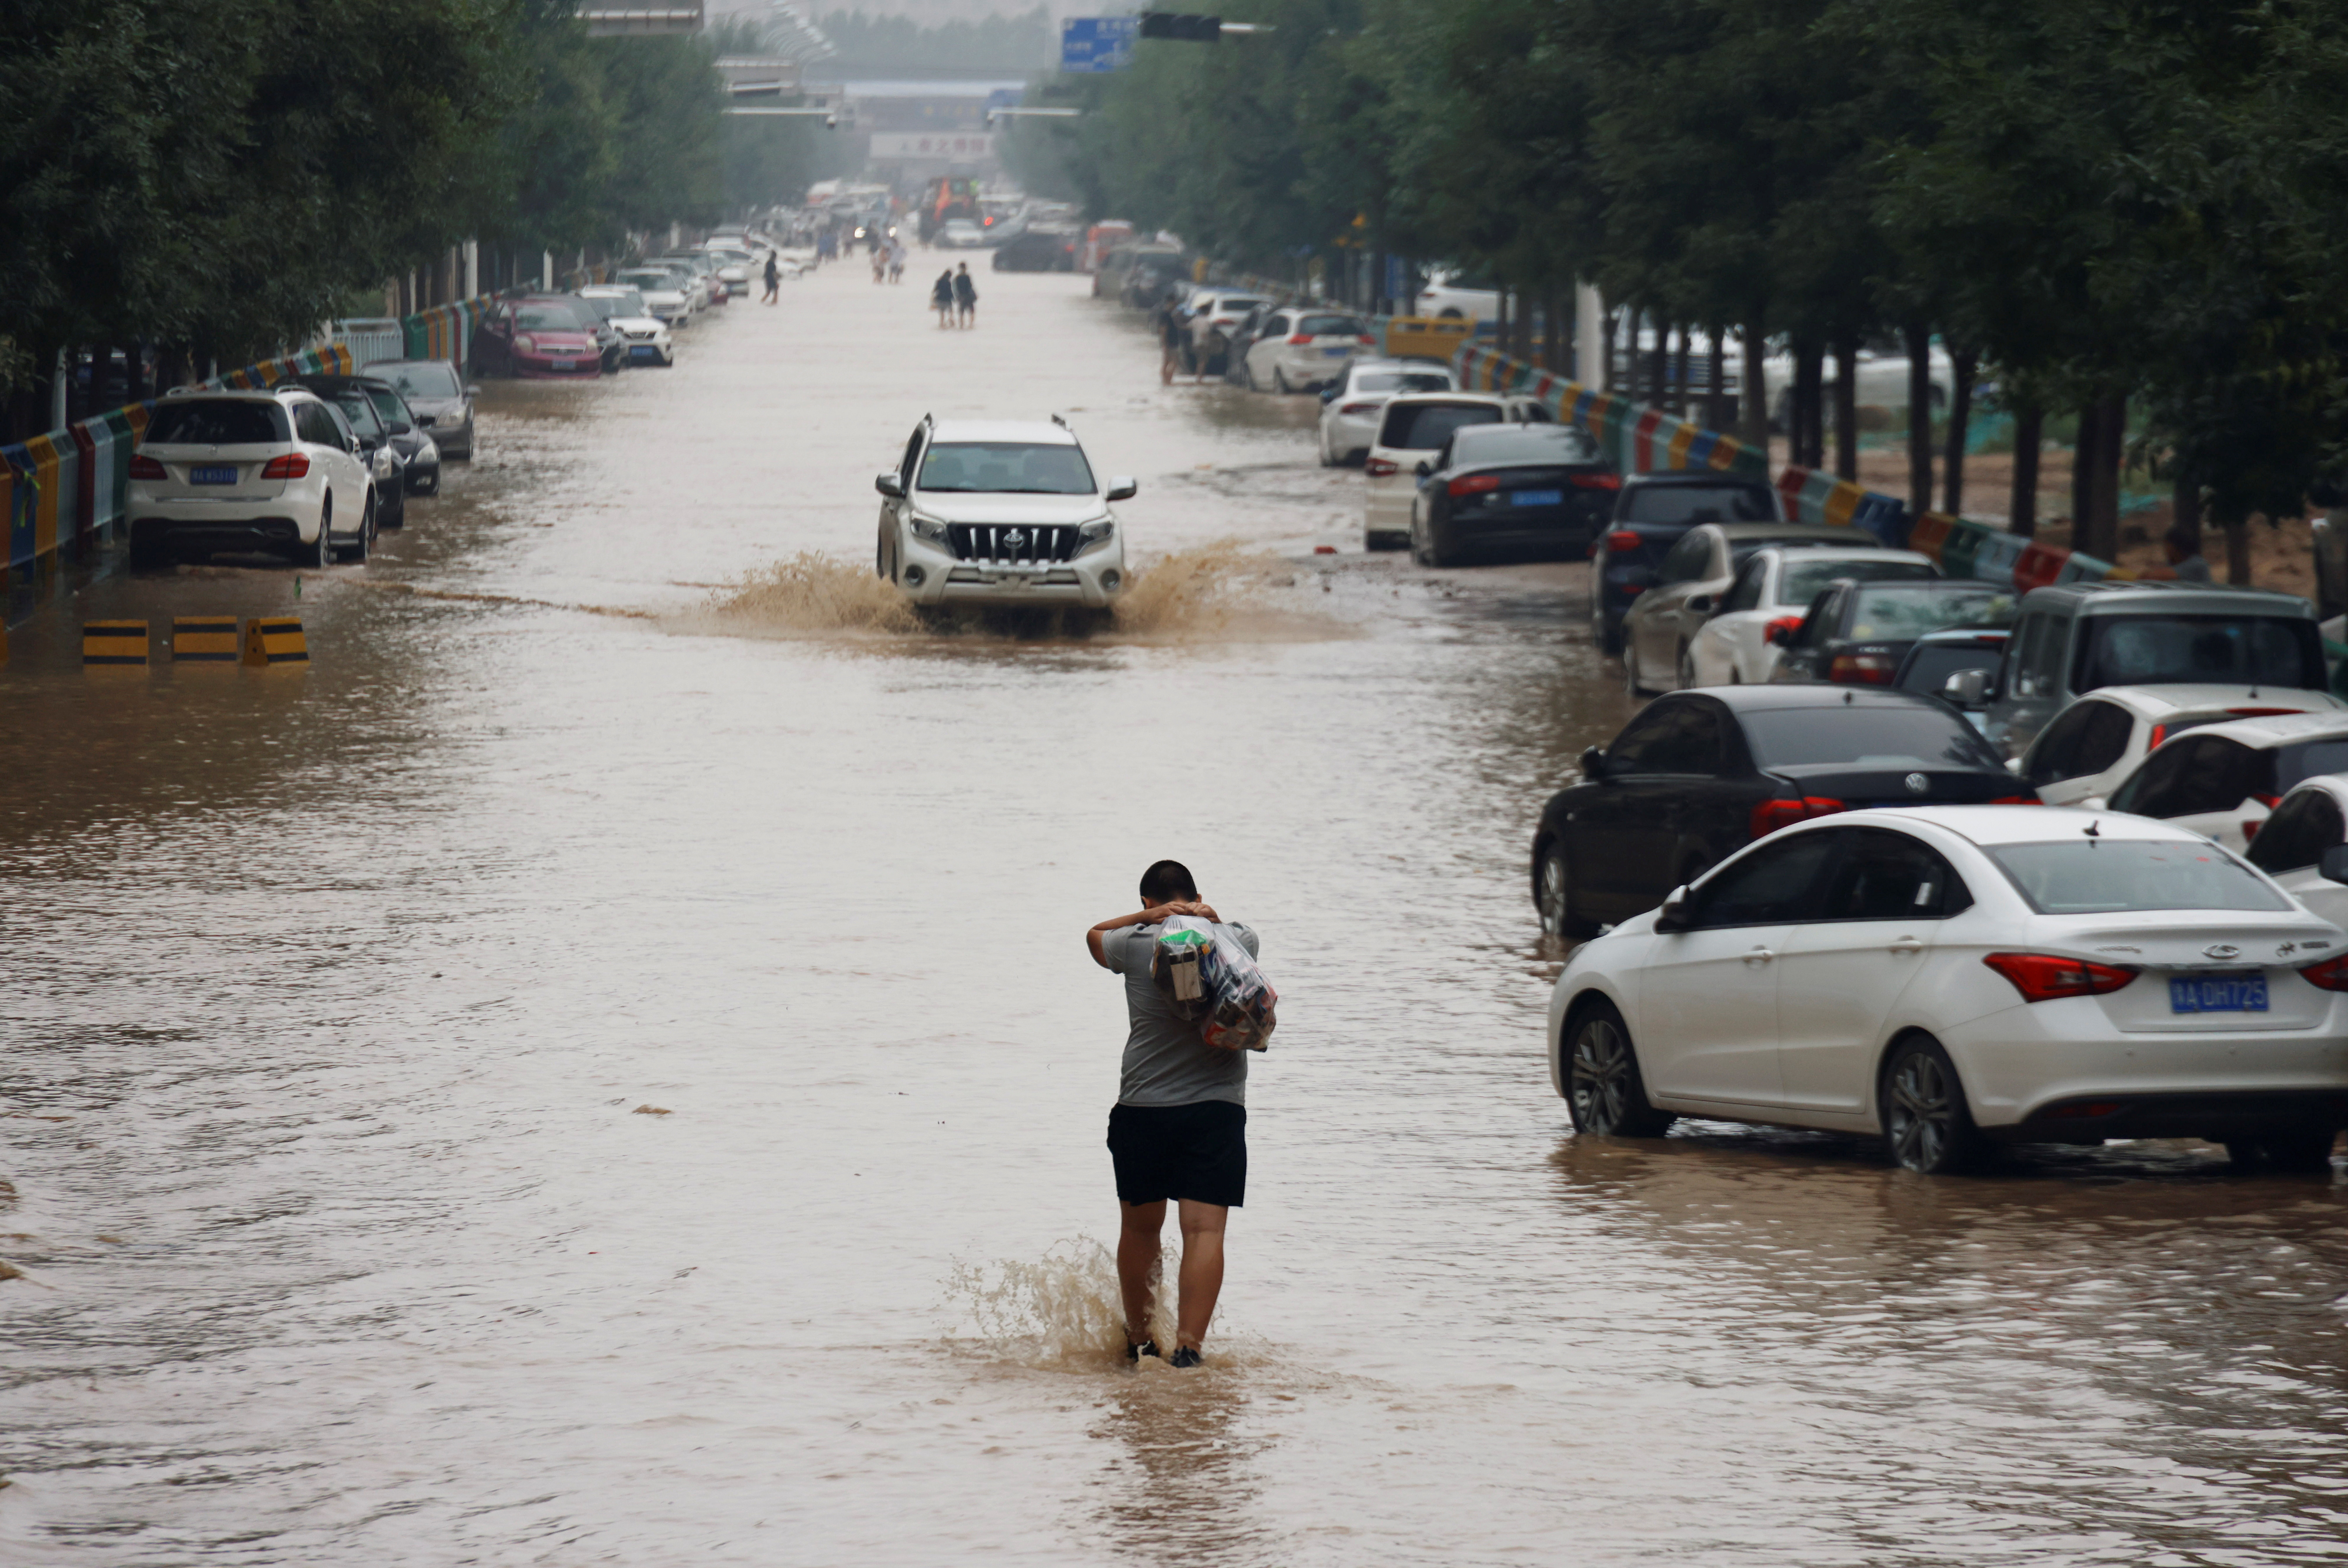 a man wades through a flooded road following heavy rainfall in Zhengzhou, Henan province, China July 23, 2021